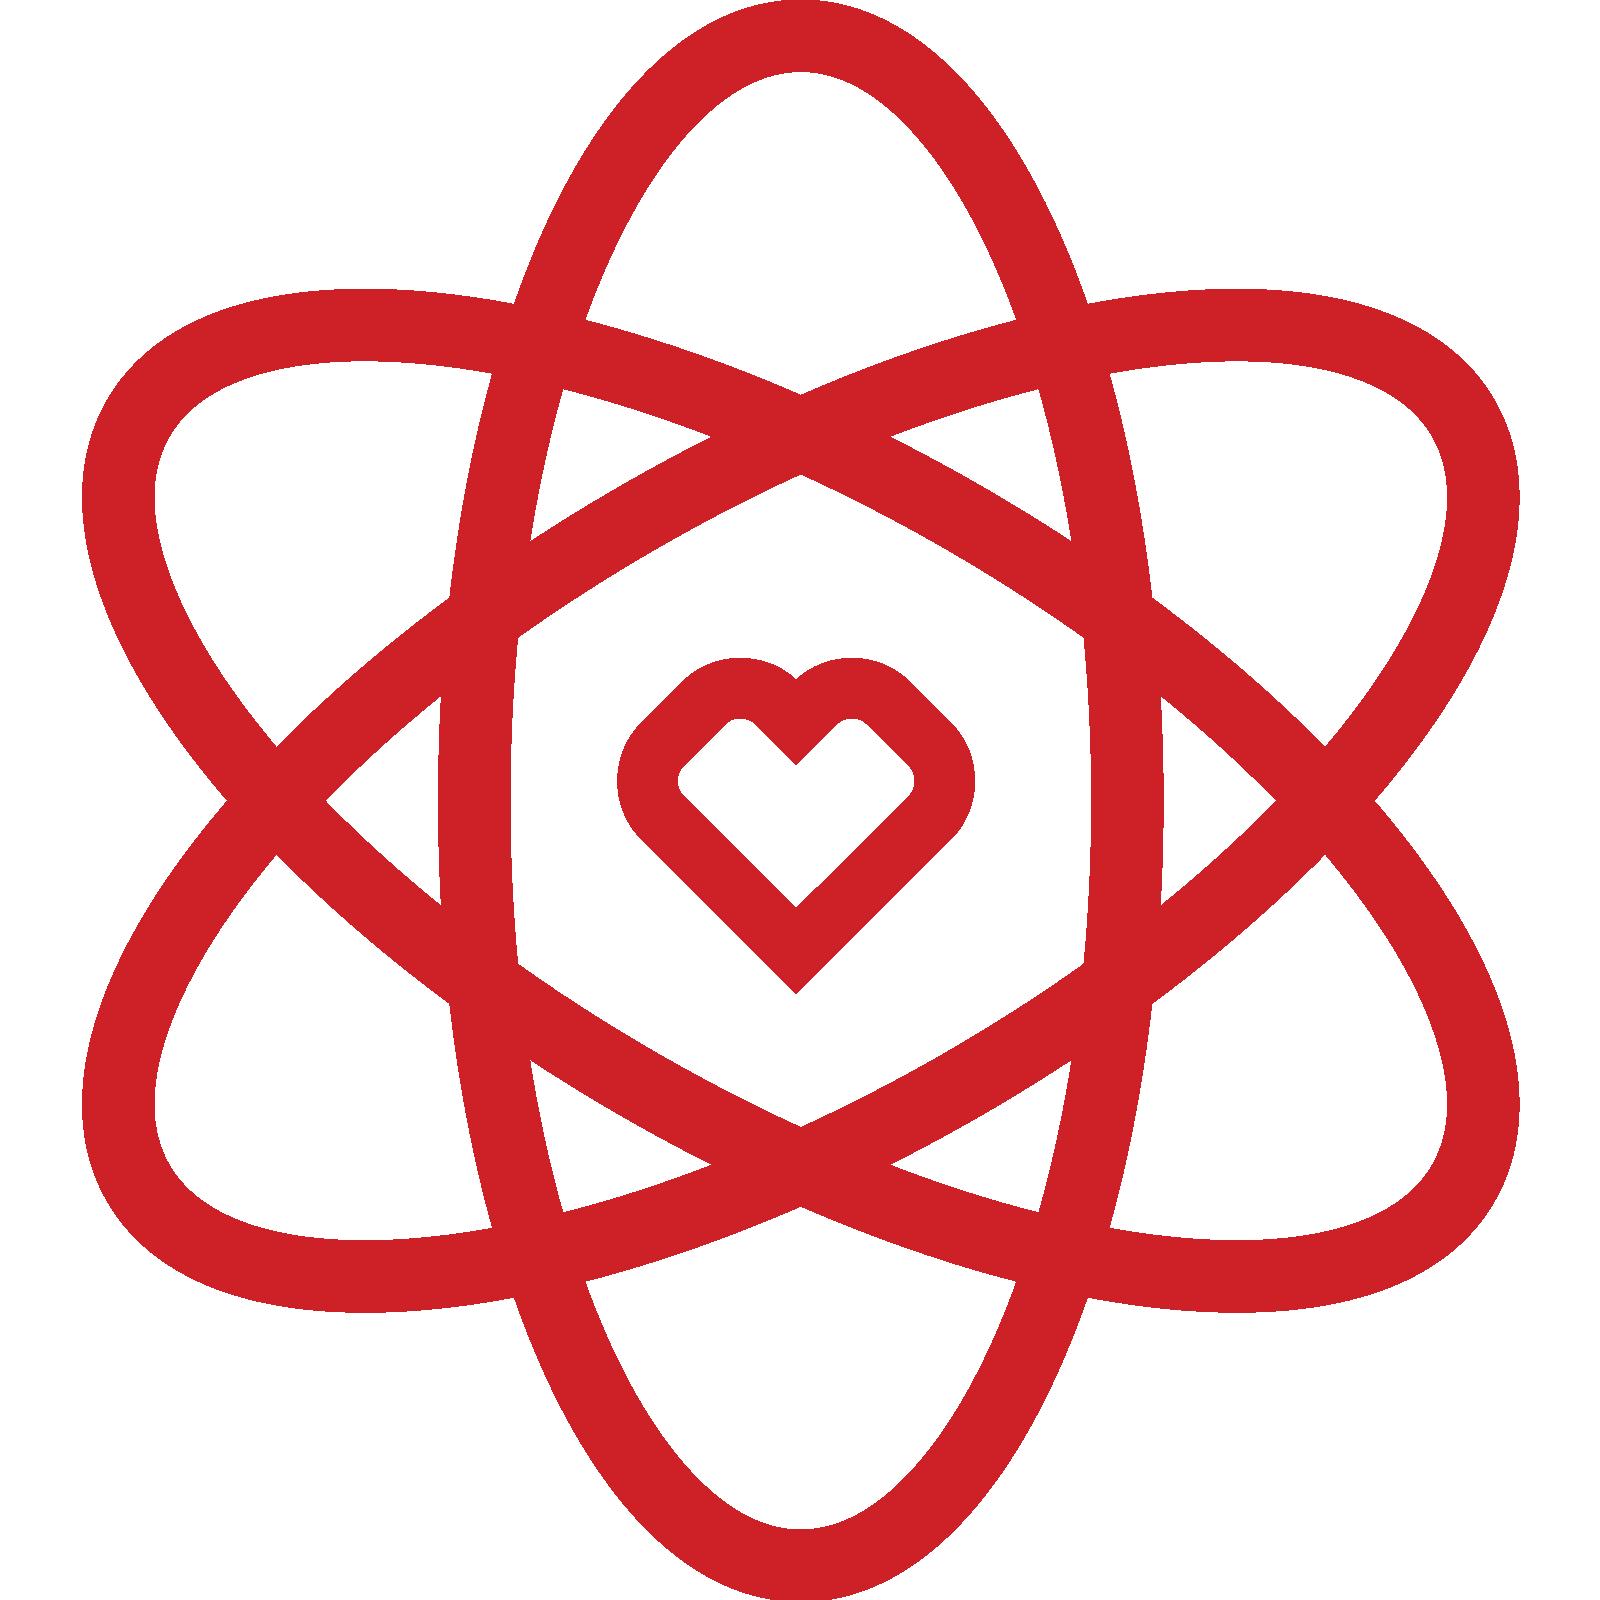 Atom heart icon